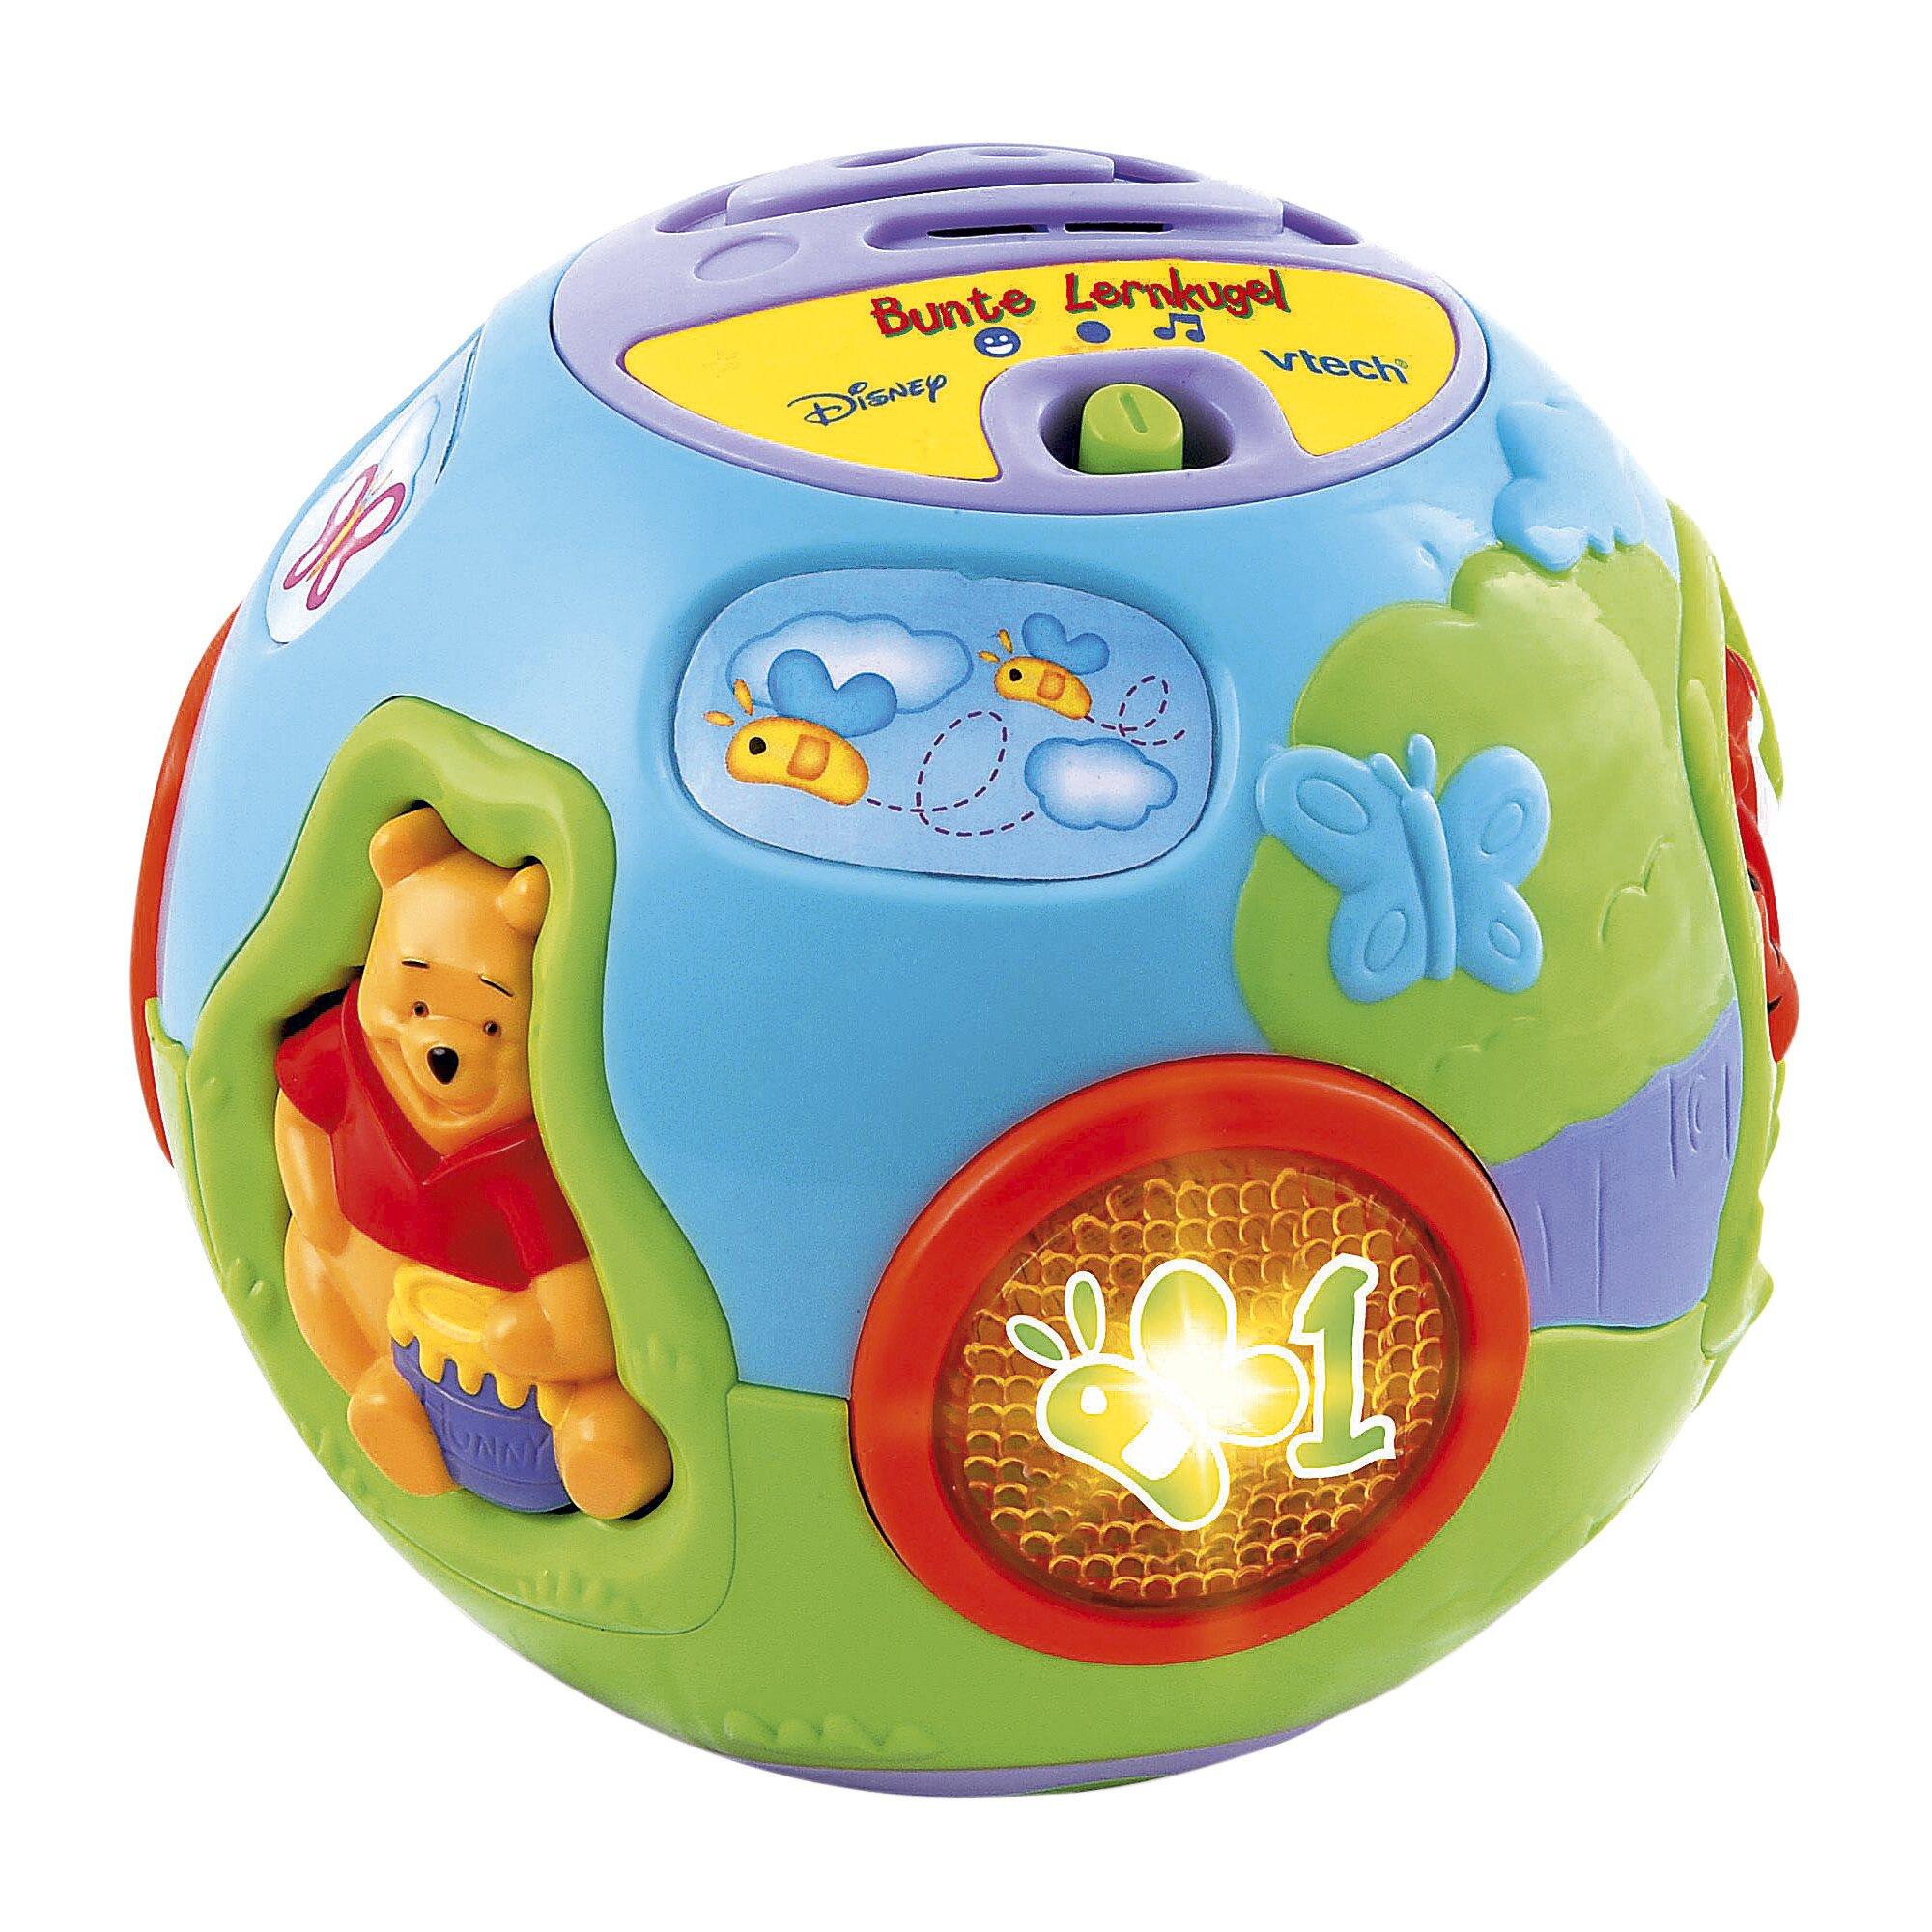 Disney Winnie Puuh Musikspielzeug Bunte Lernkugel